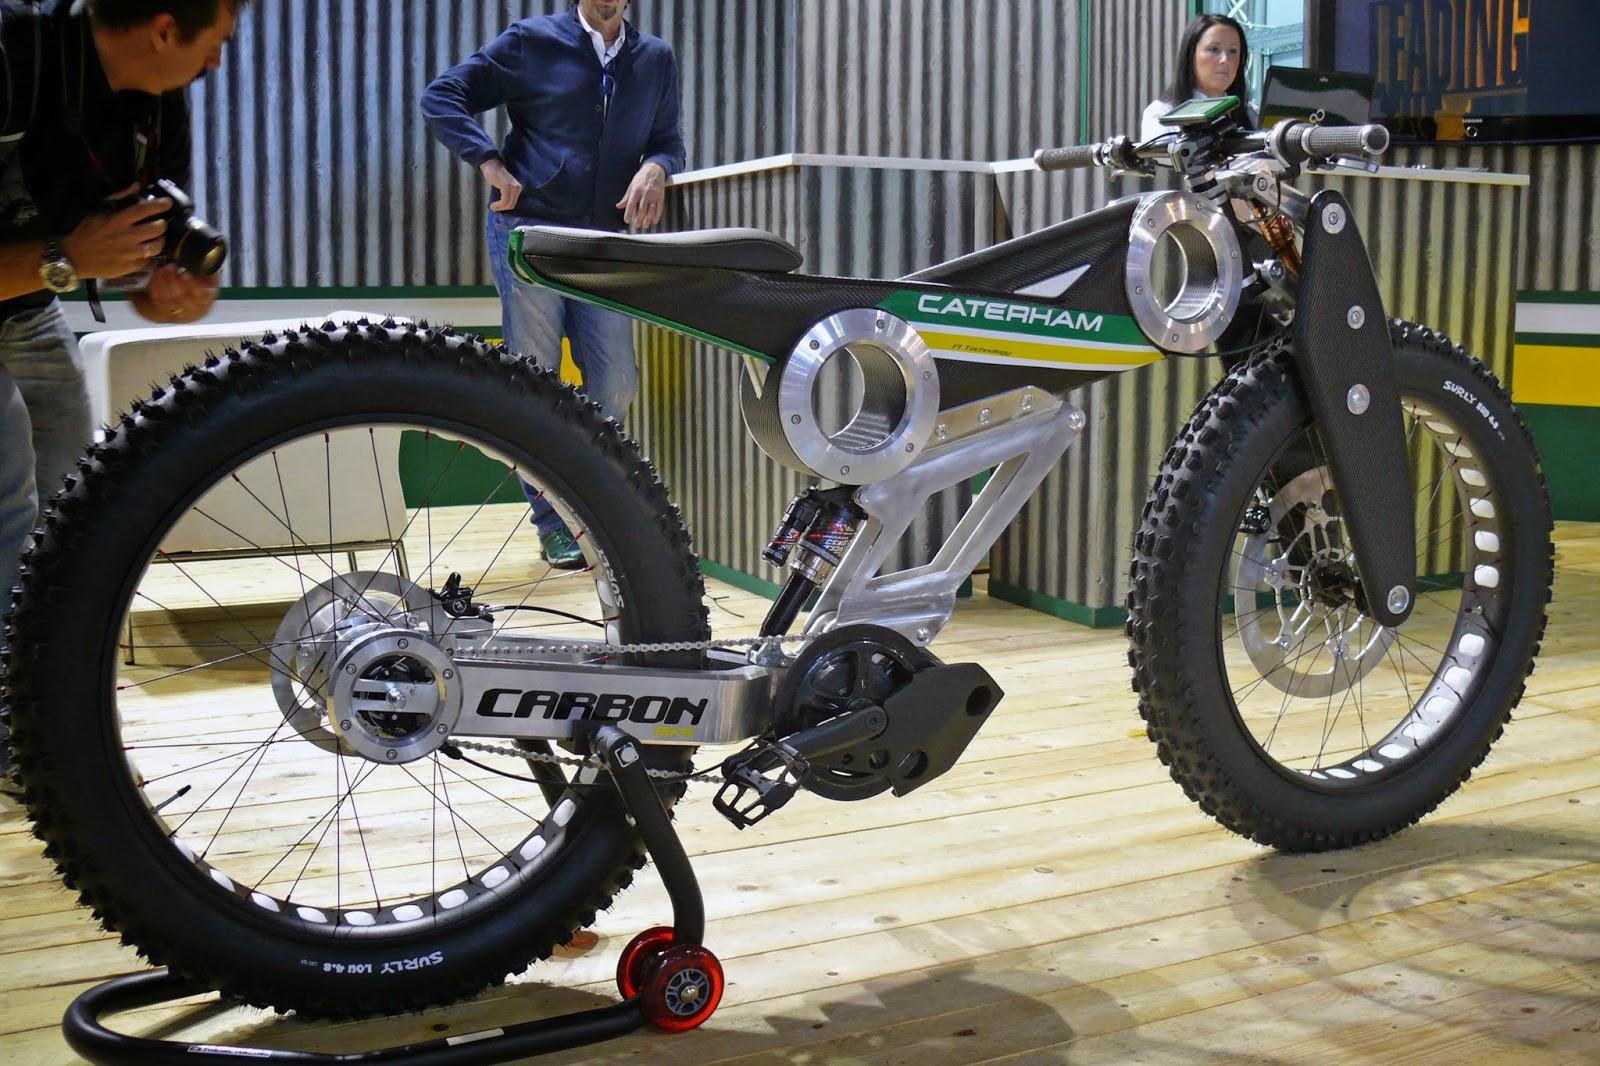 Caterham Carbon E Bike Price 28 Images Rennkollektiv